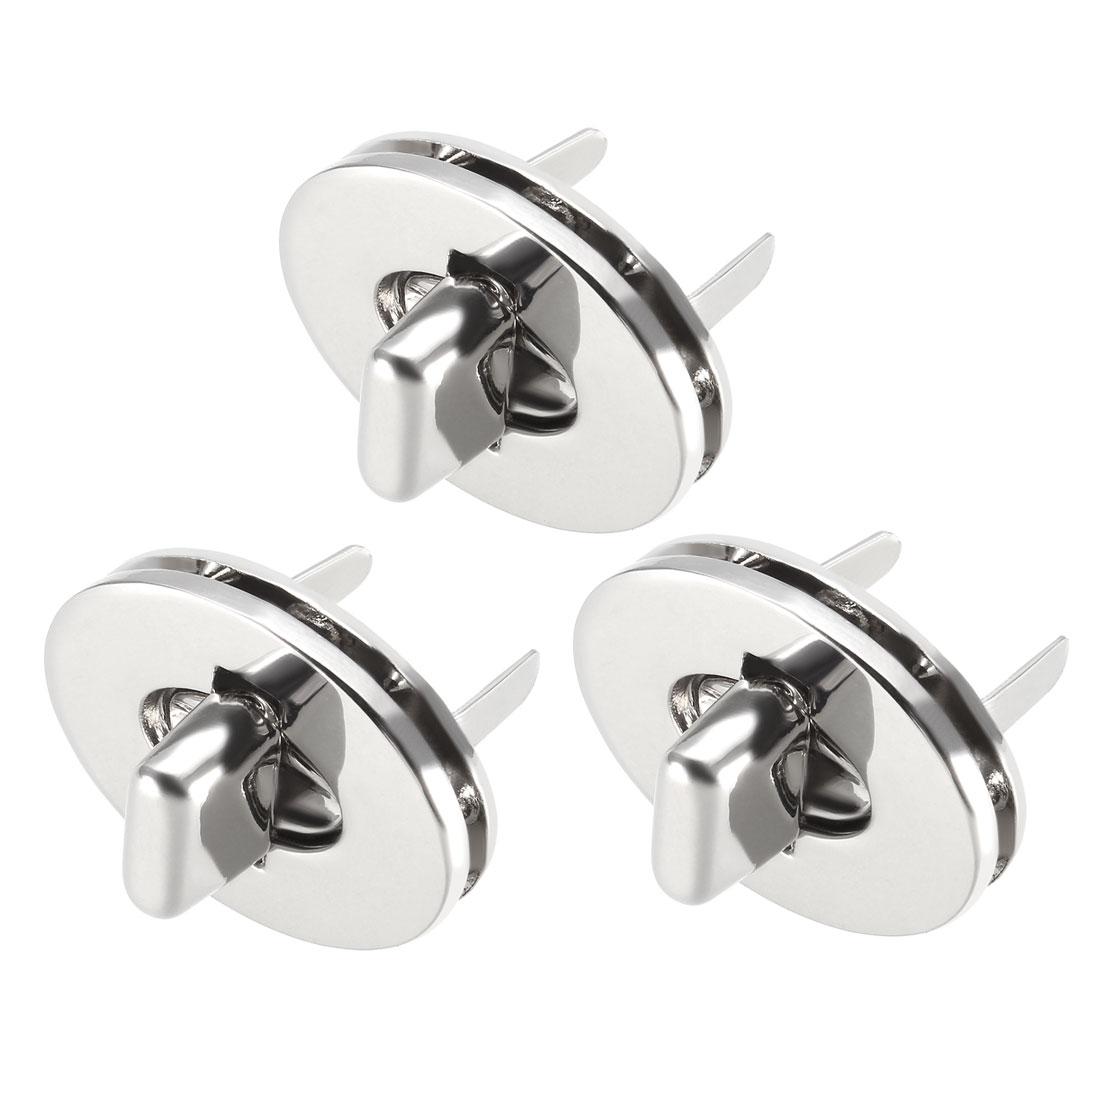 3 Sets Oval Purses Twist Lock 30mm x 24mm Closures for DIY Bag Making - Silver